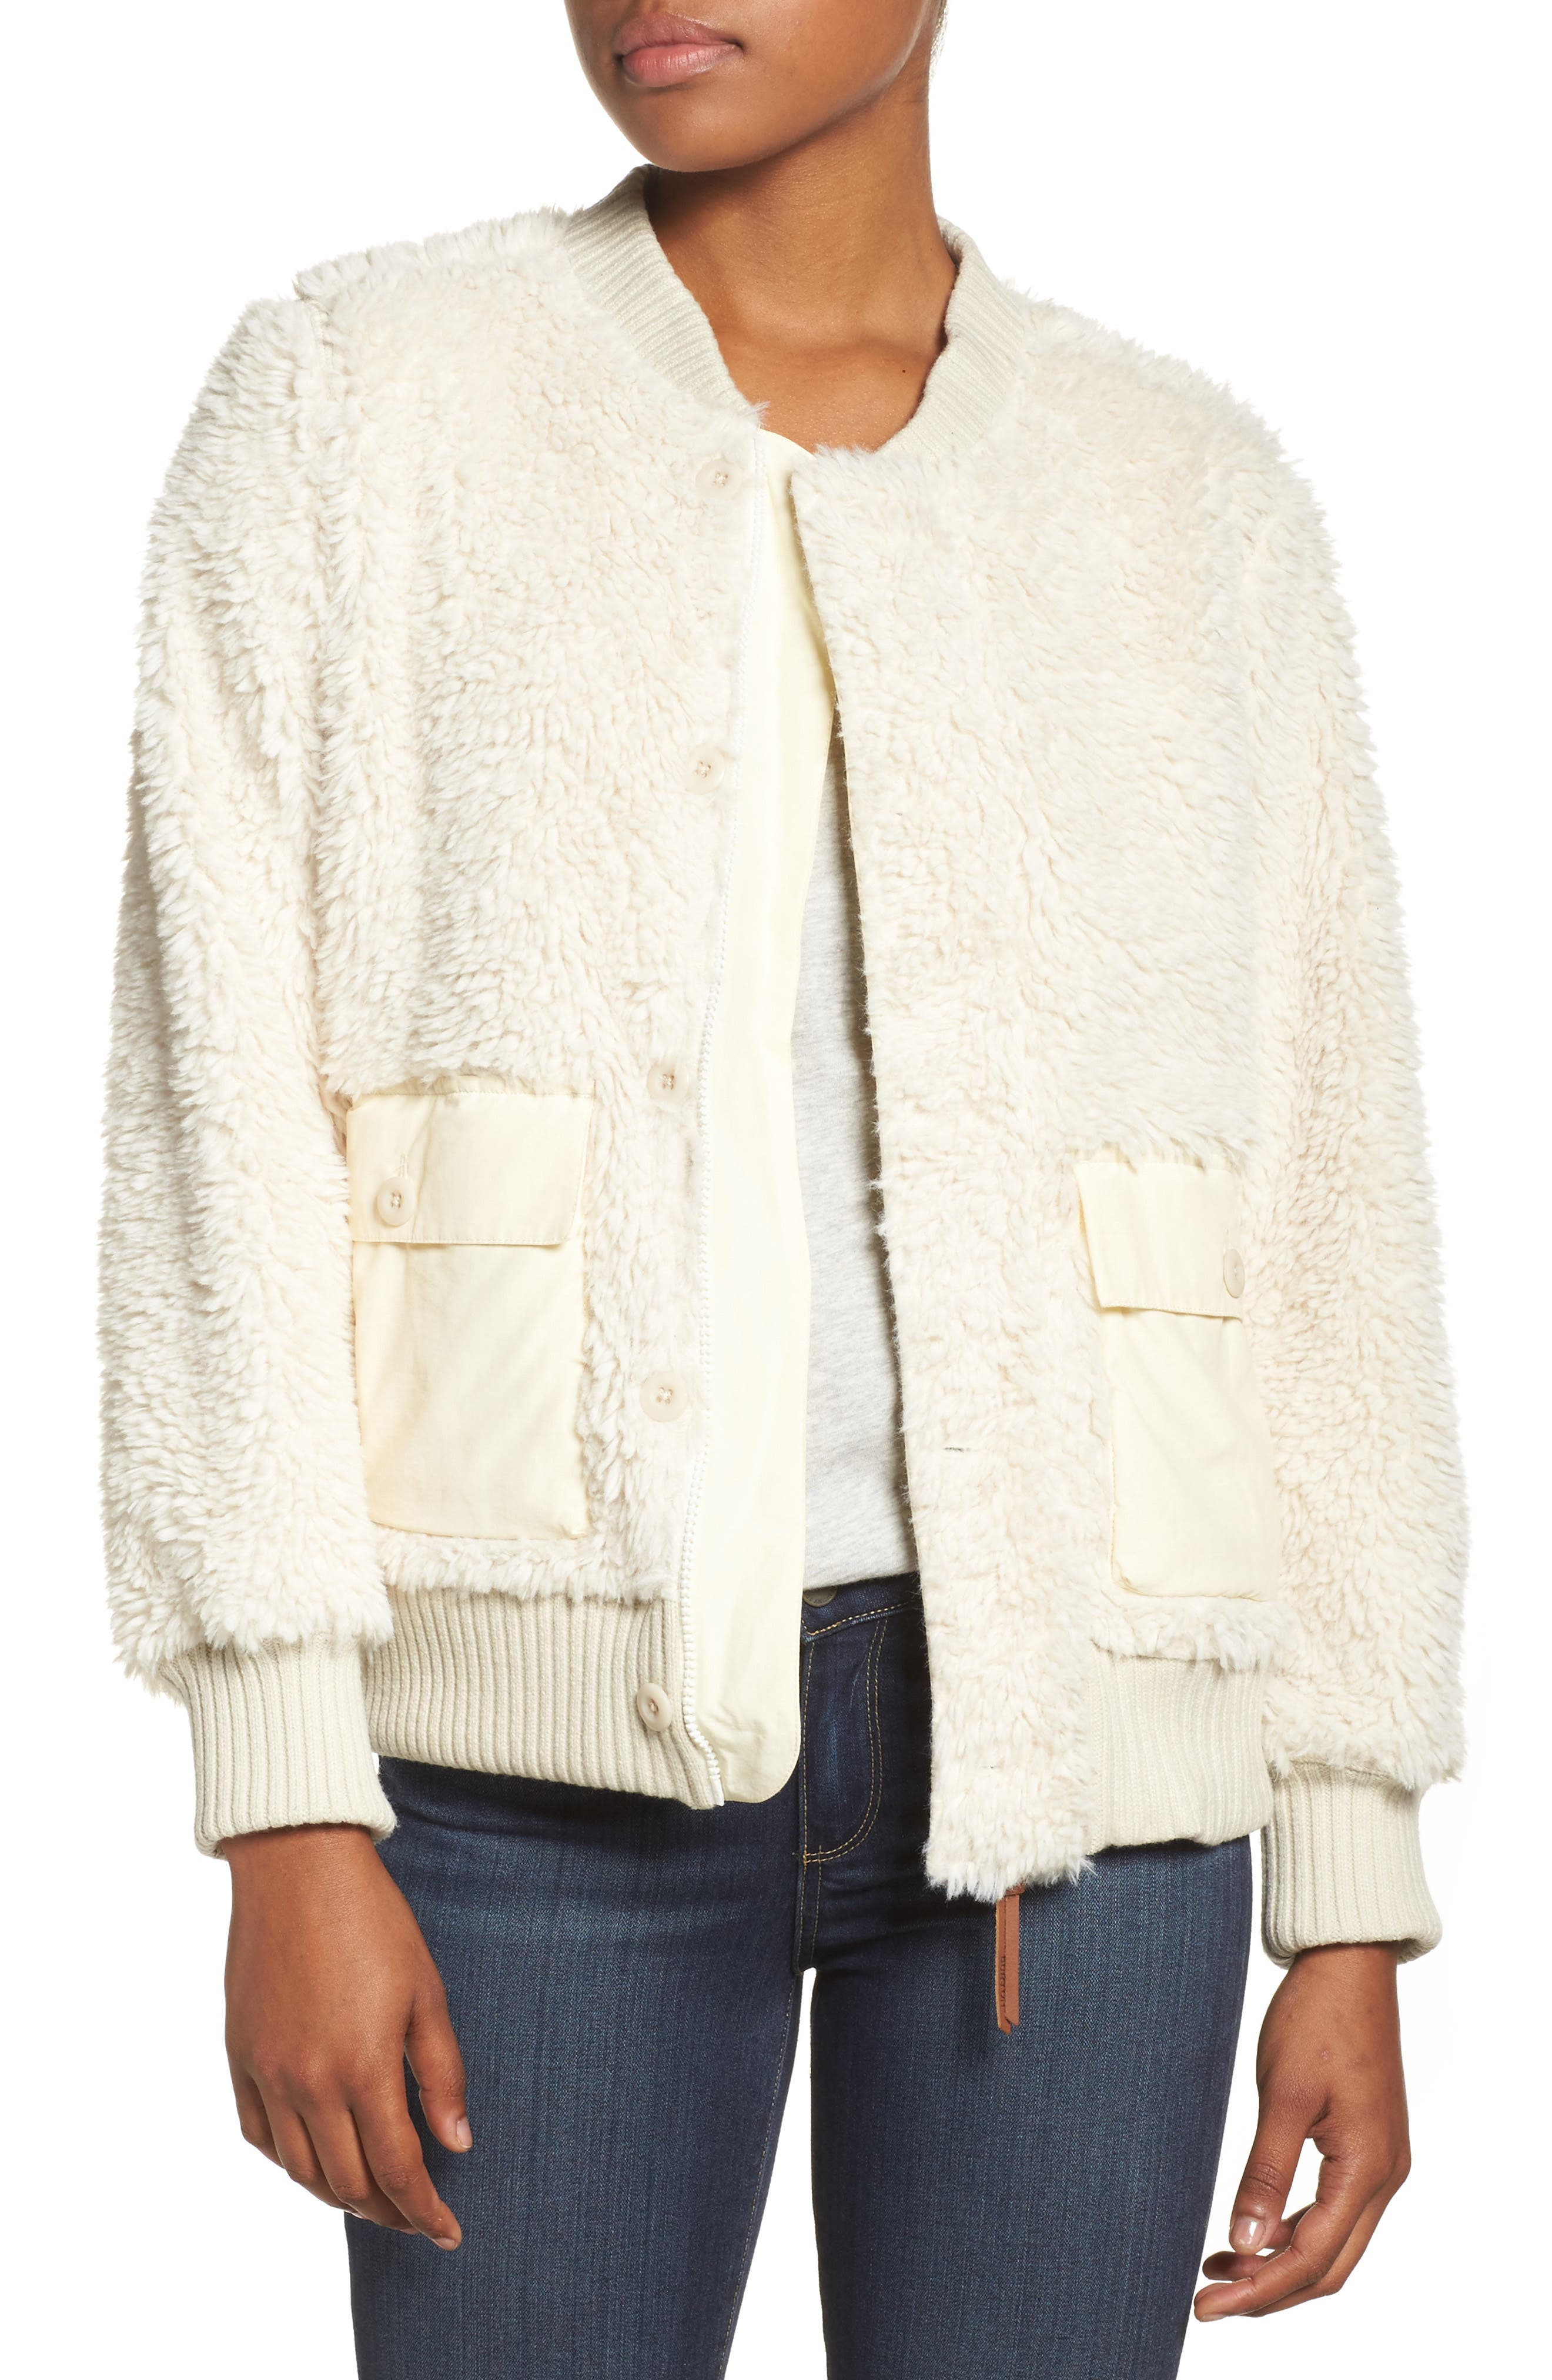 Shawmut High Pile DRYRIDE Thermex Fleece Jacket,                         Main,                         color, Bone White